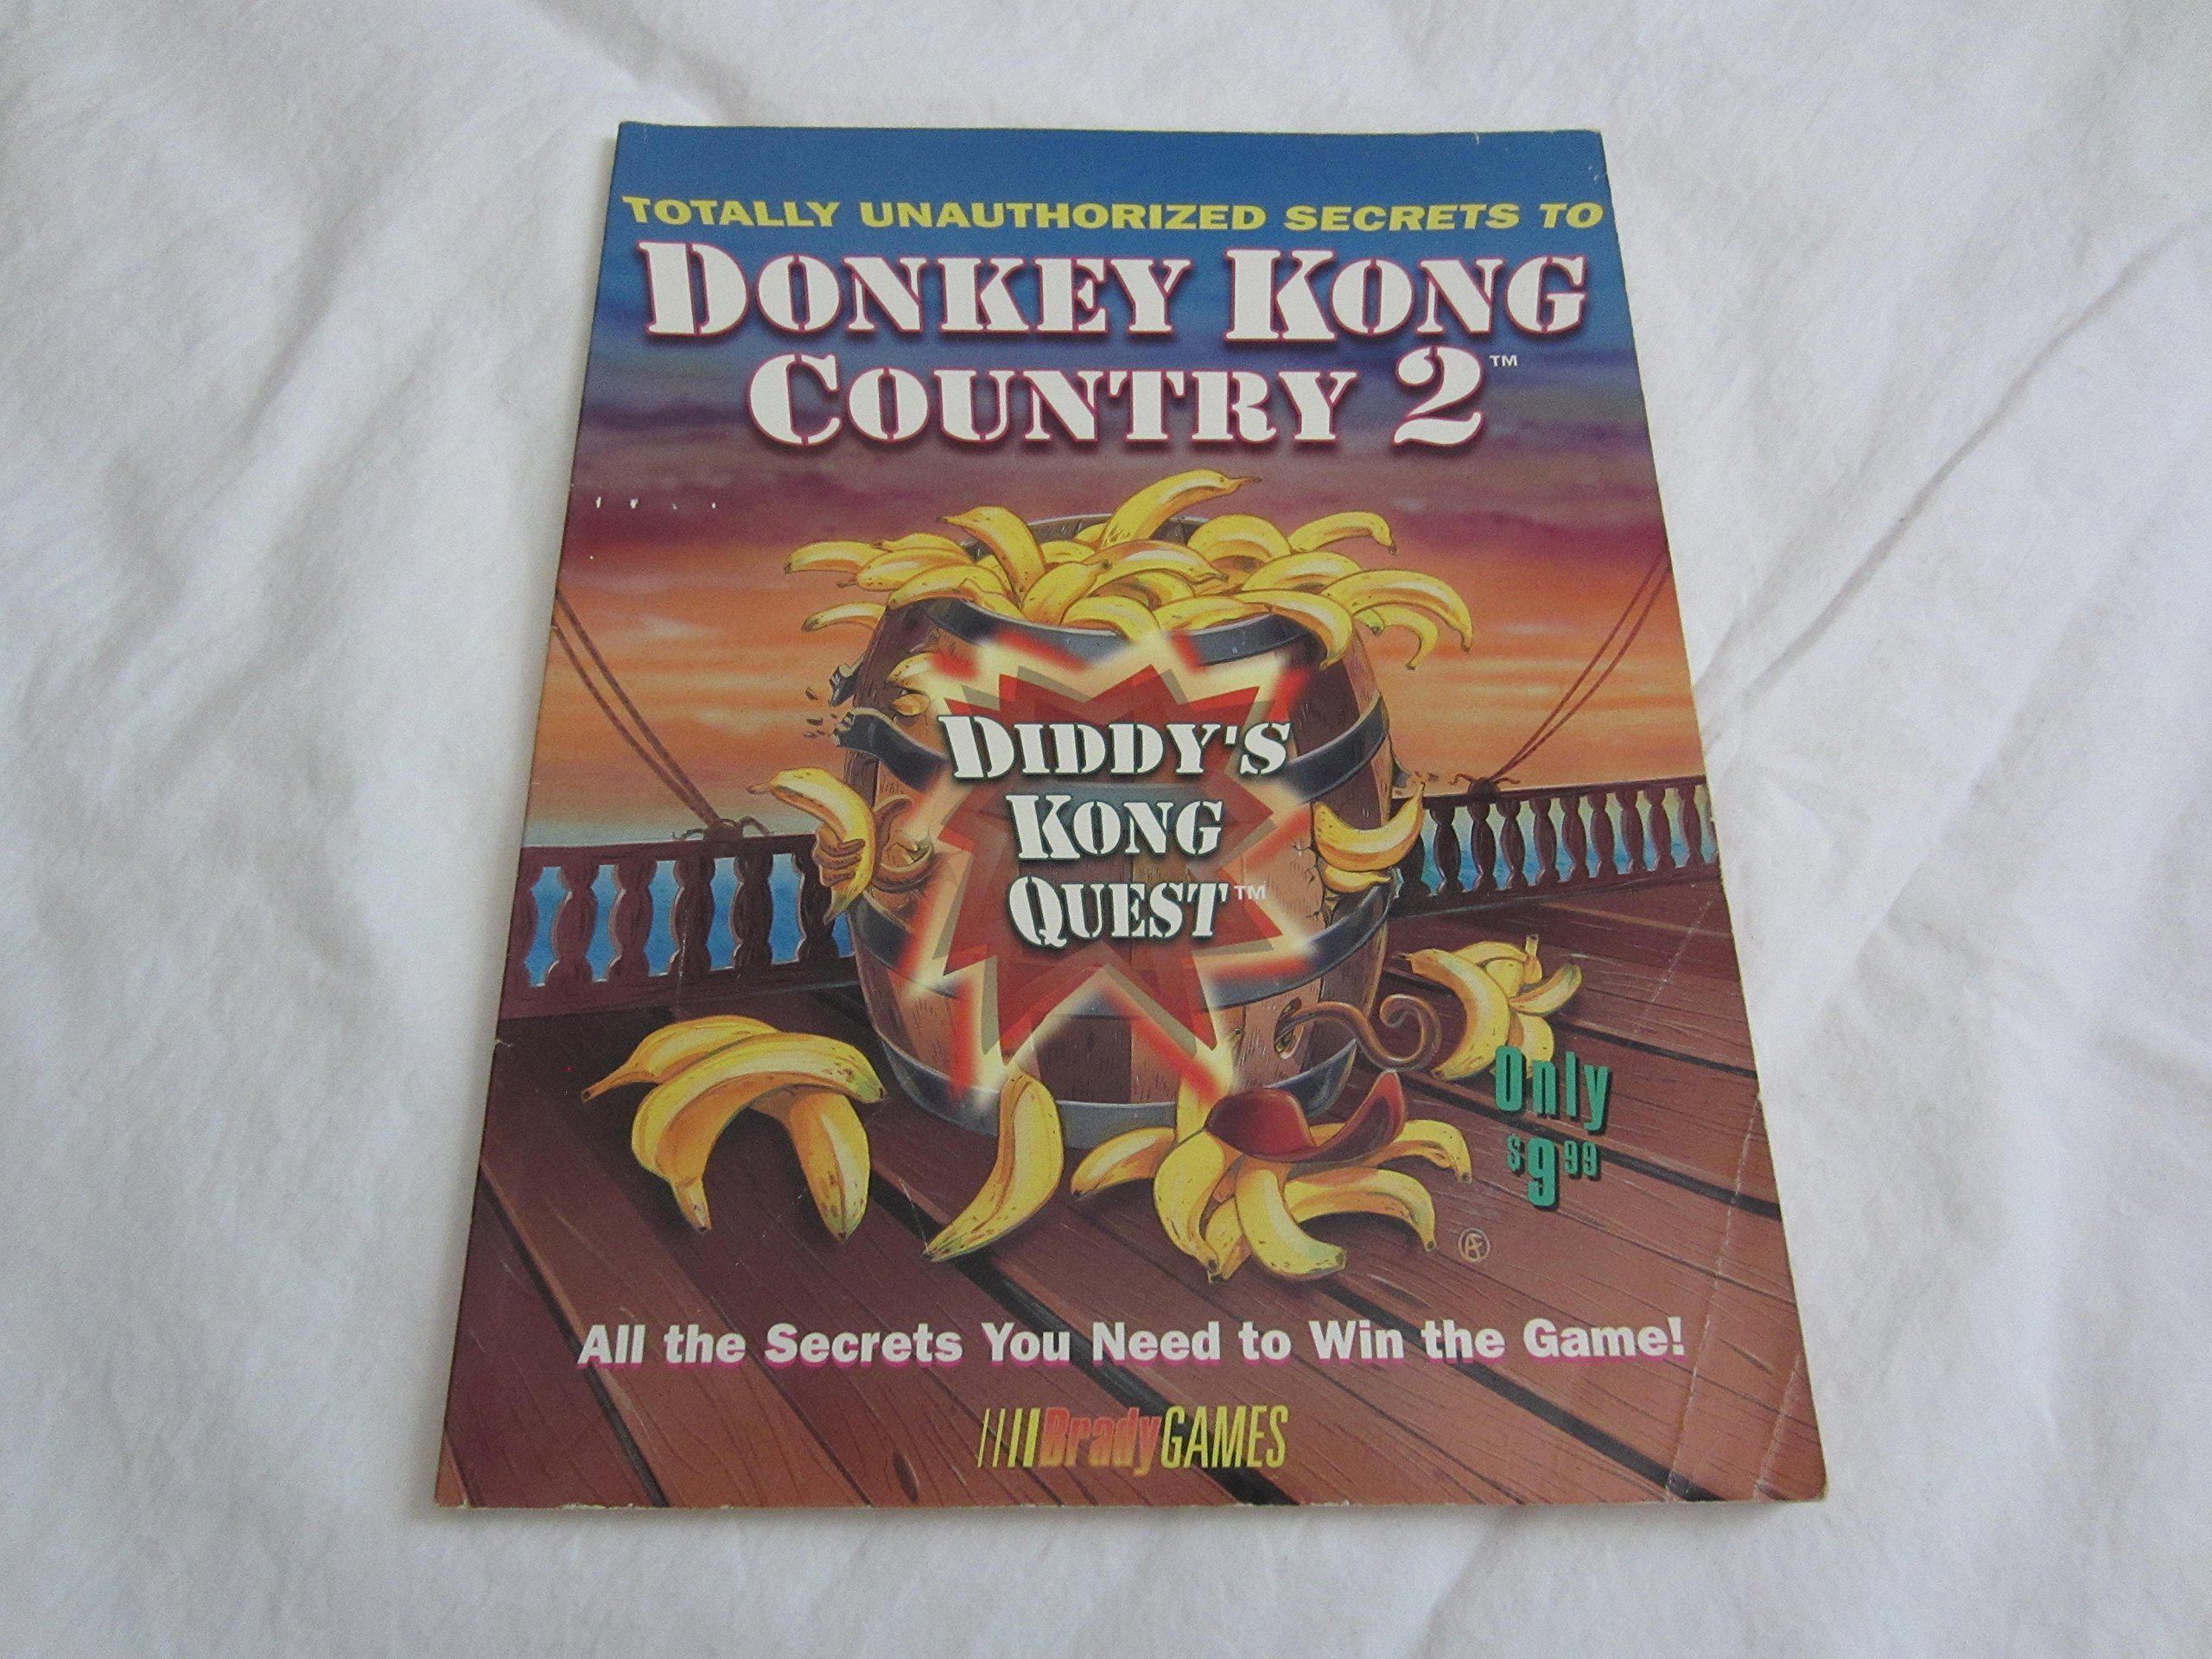 Totally Unauthorized Secrets To Donkey Kong Country 2 Brady Games BradyGames 9781566863186 Amazon Books